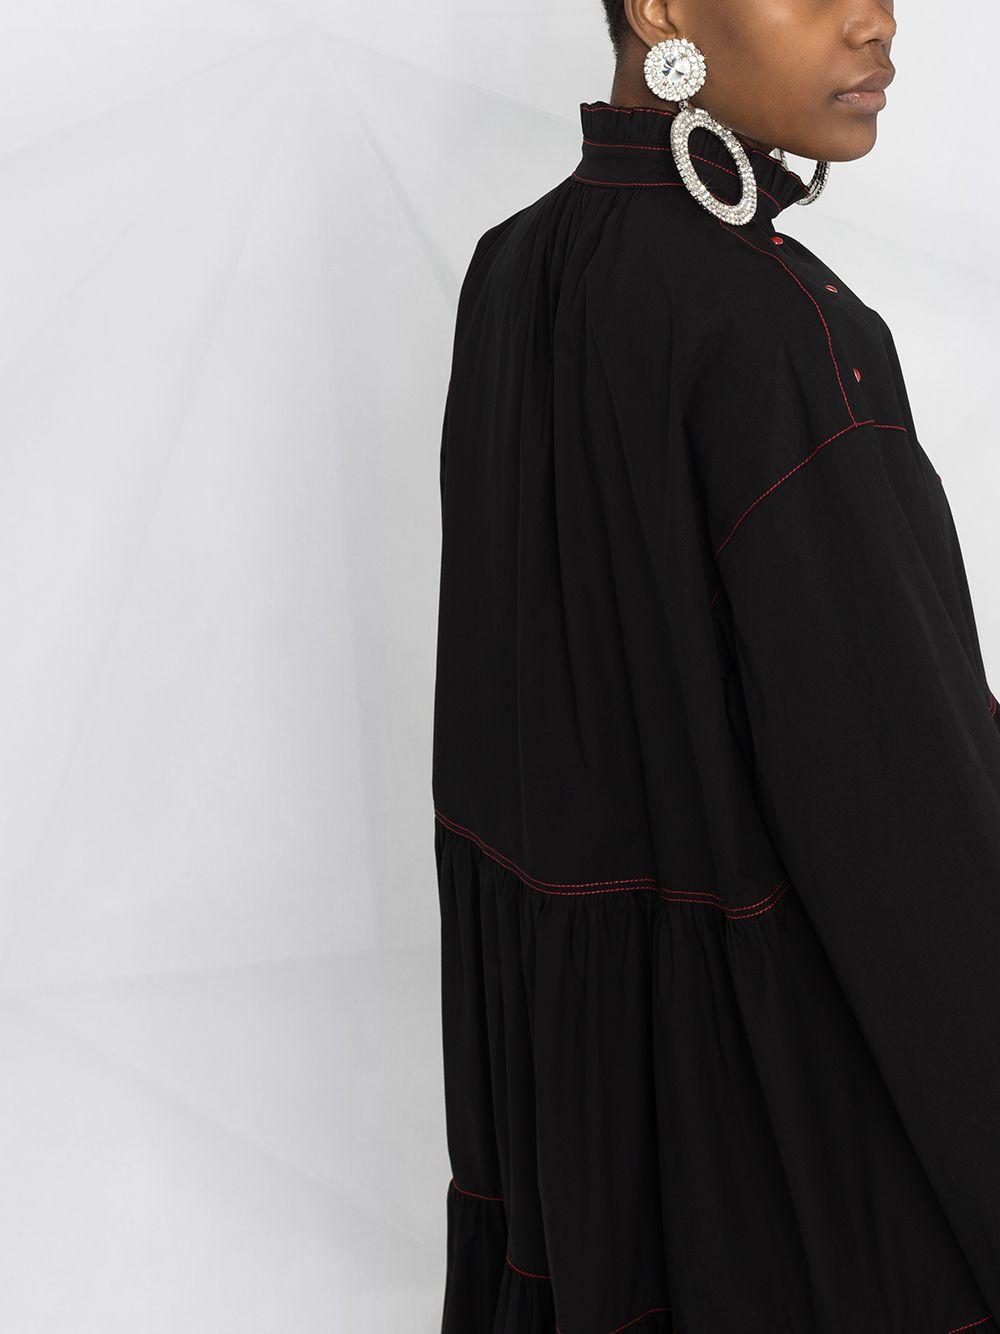 PHILOSOPHY di LORENZO SERAFINI | Dress | A0439744555